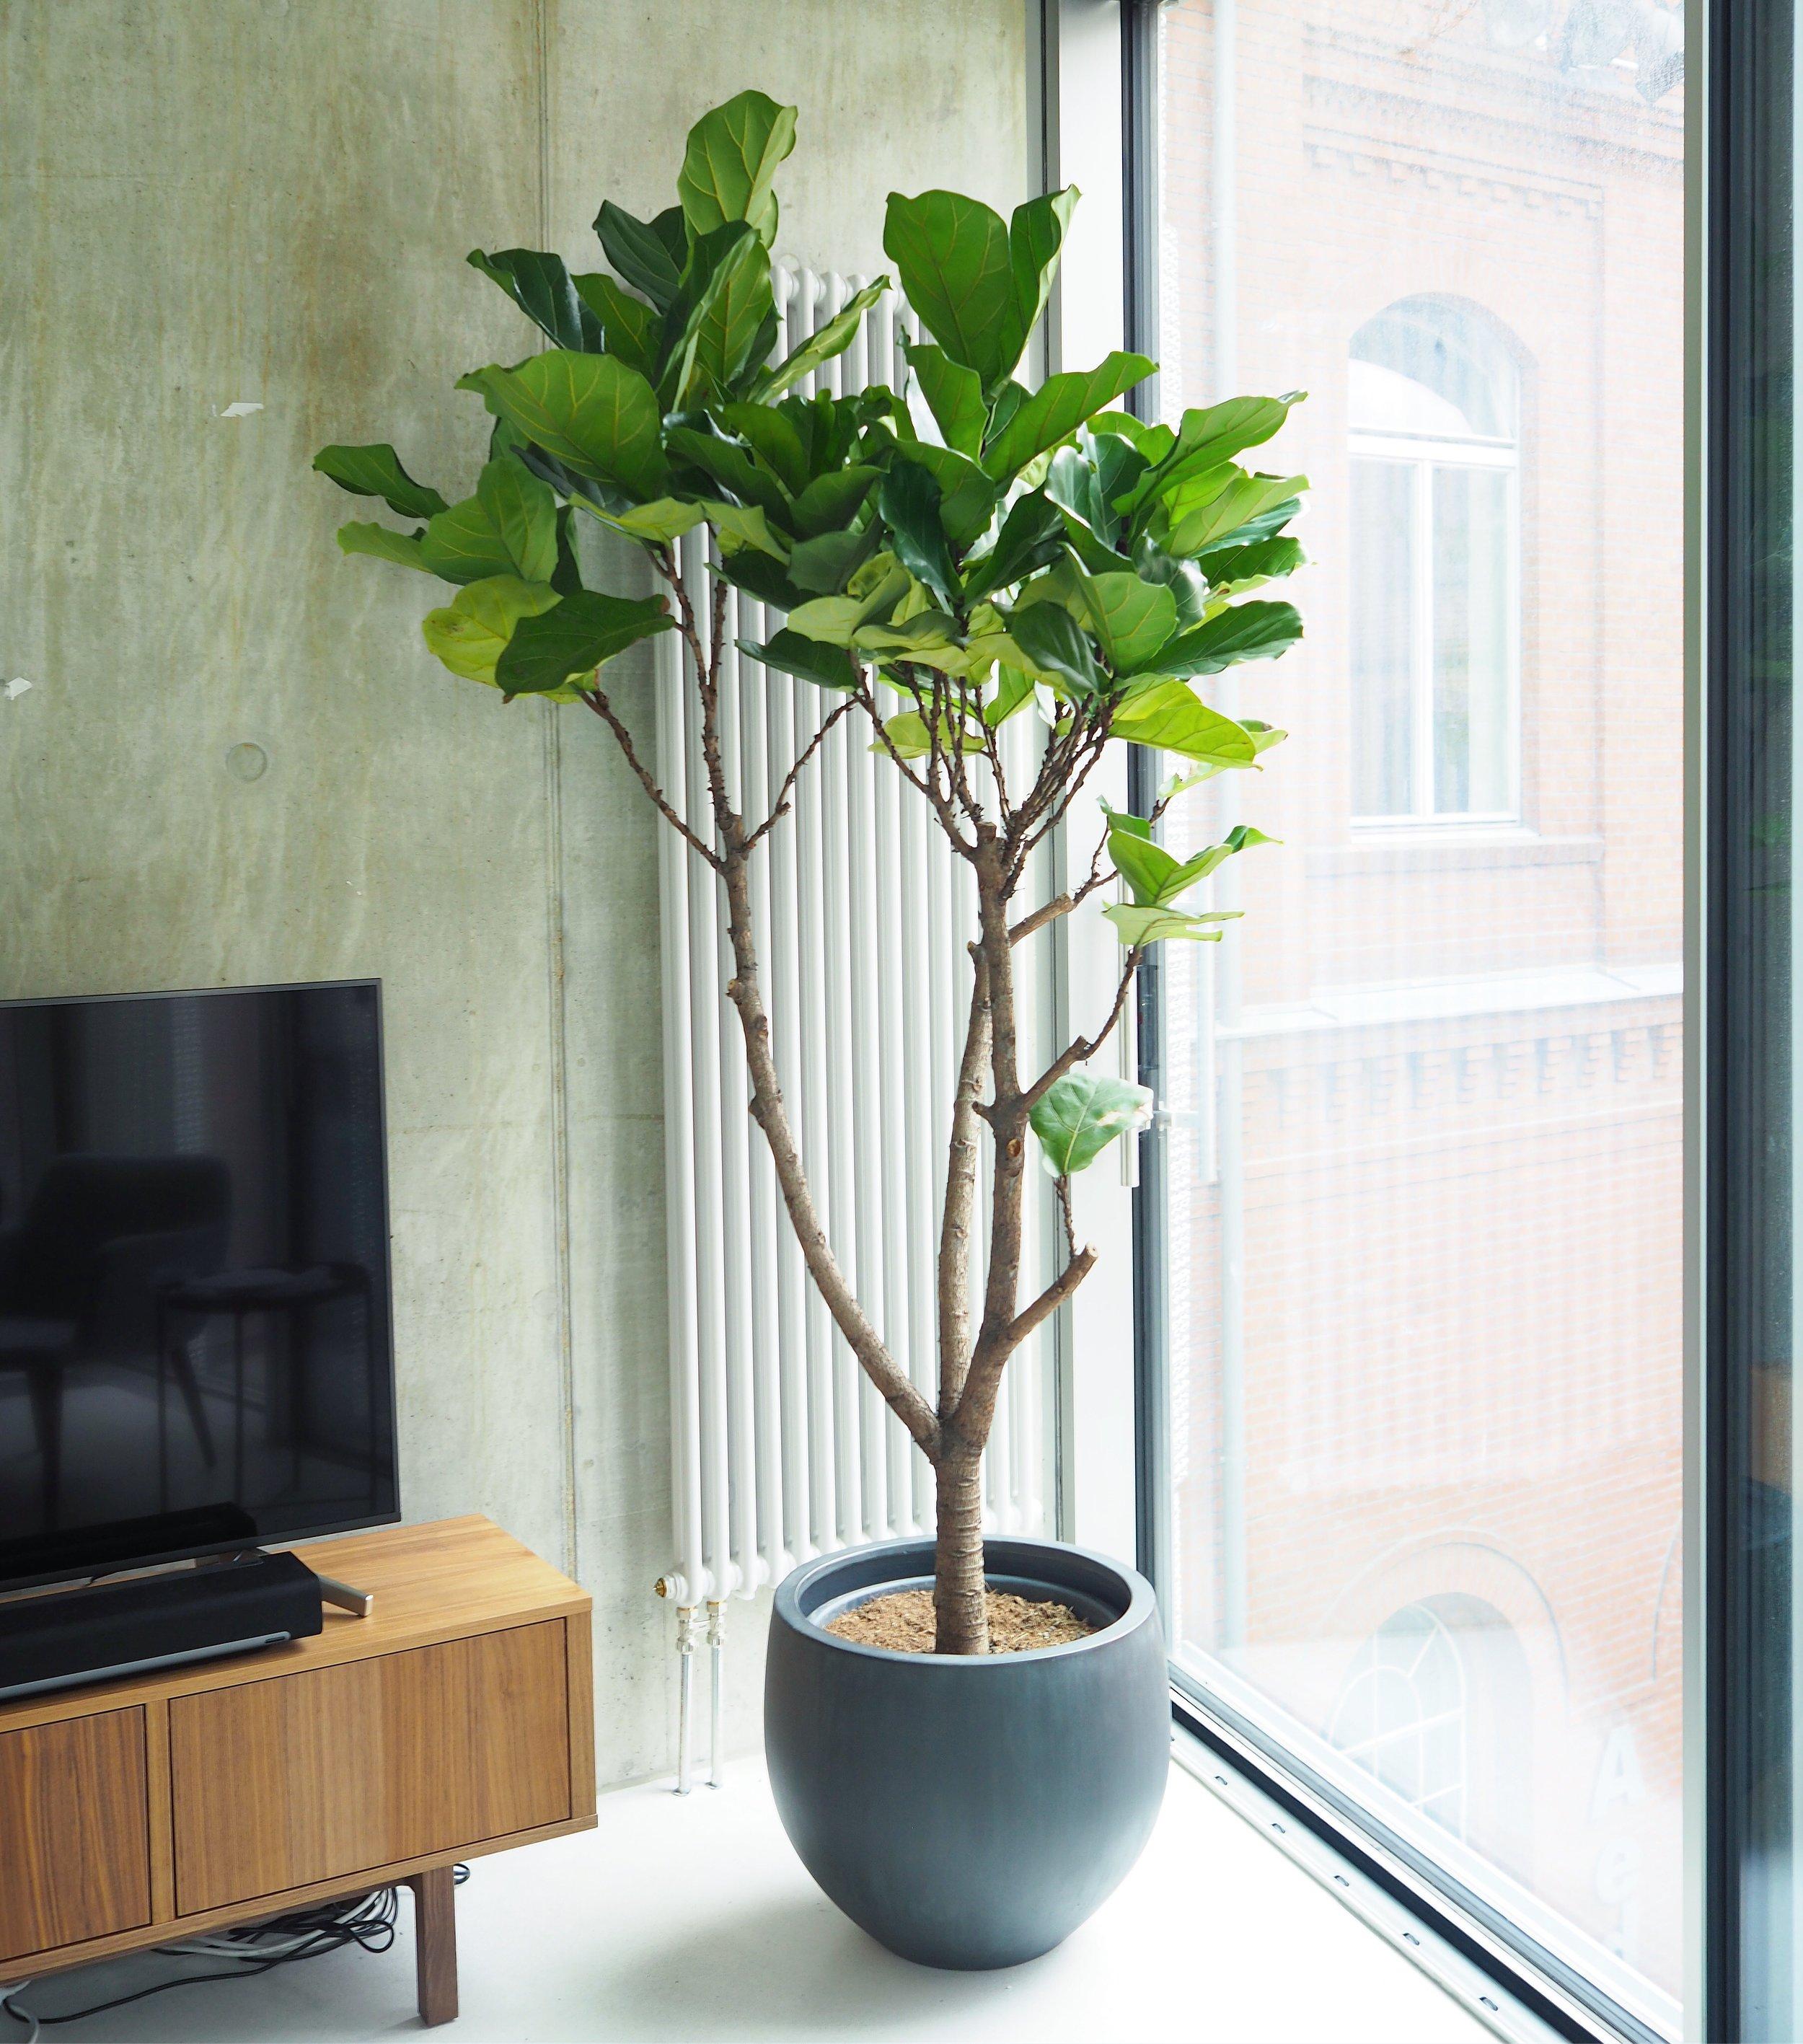 2M FICUS LYRATA TREE